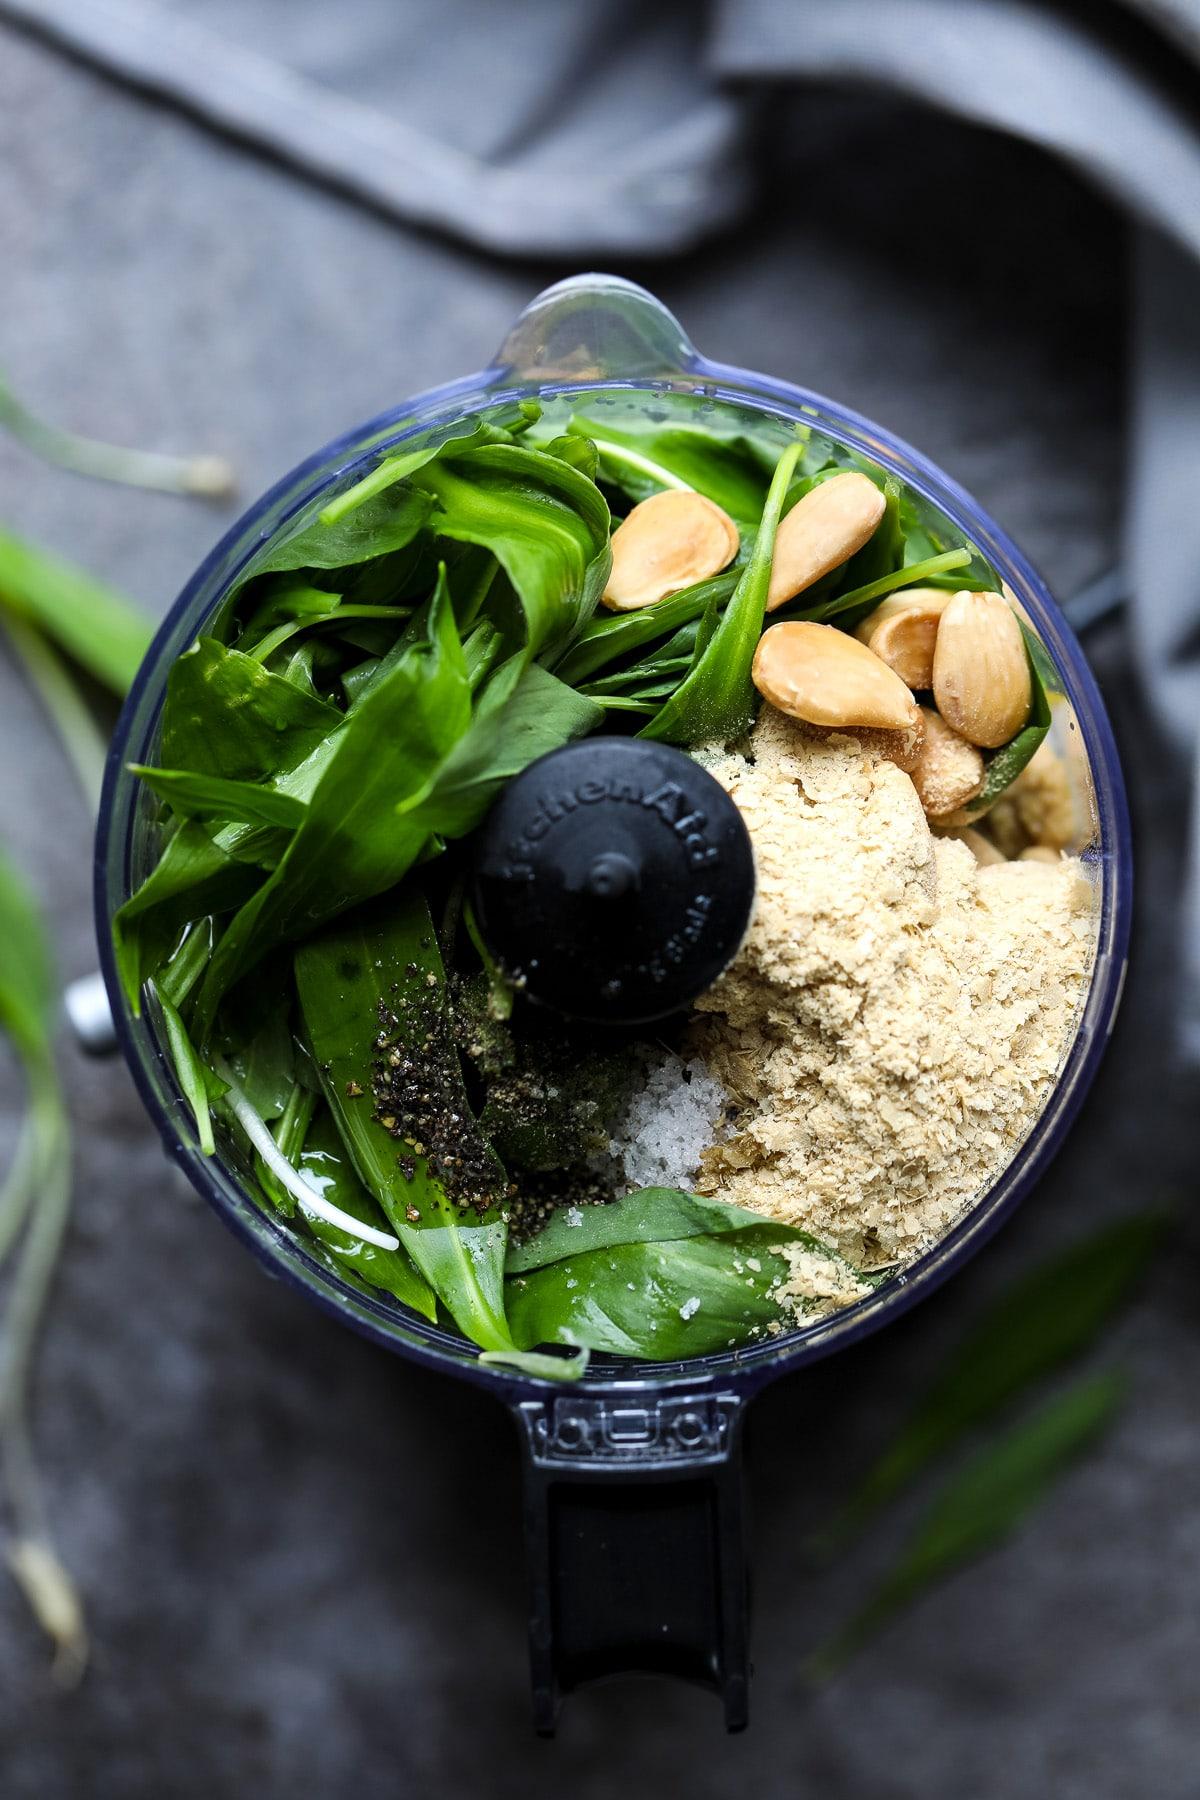 Ingredients for Ramp Pesto in a Blender.